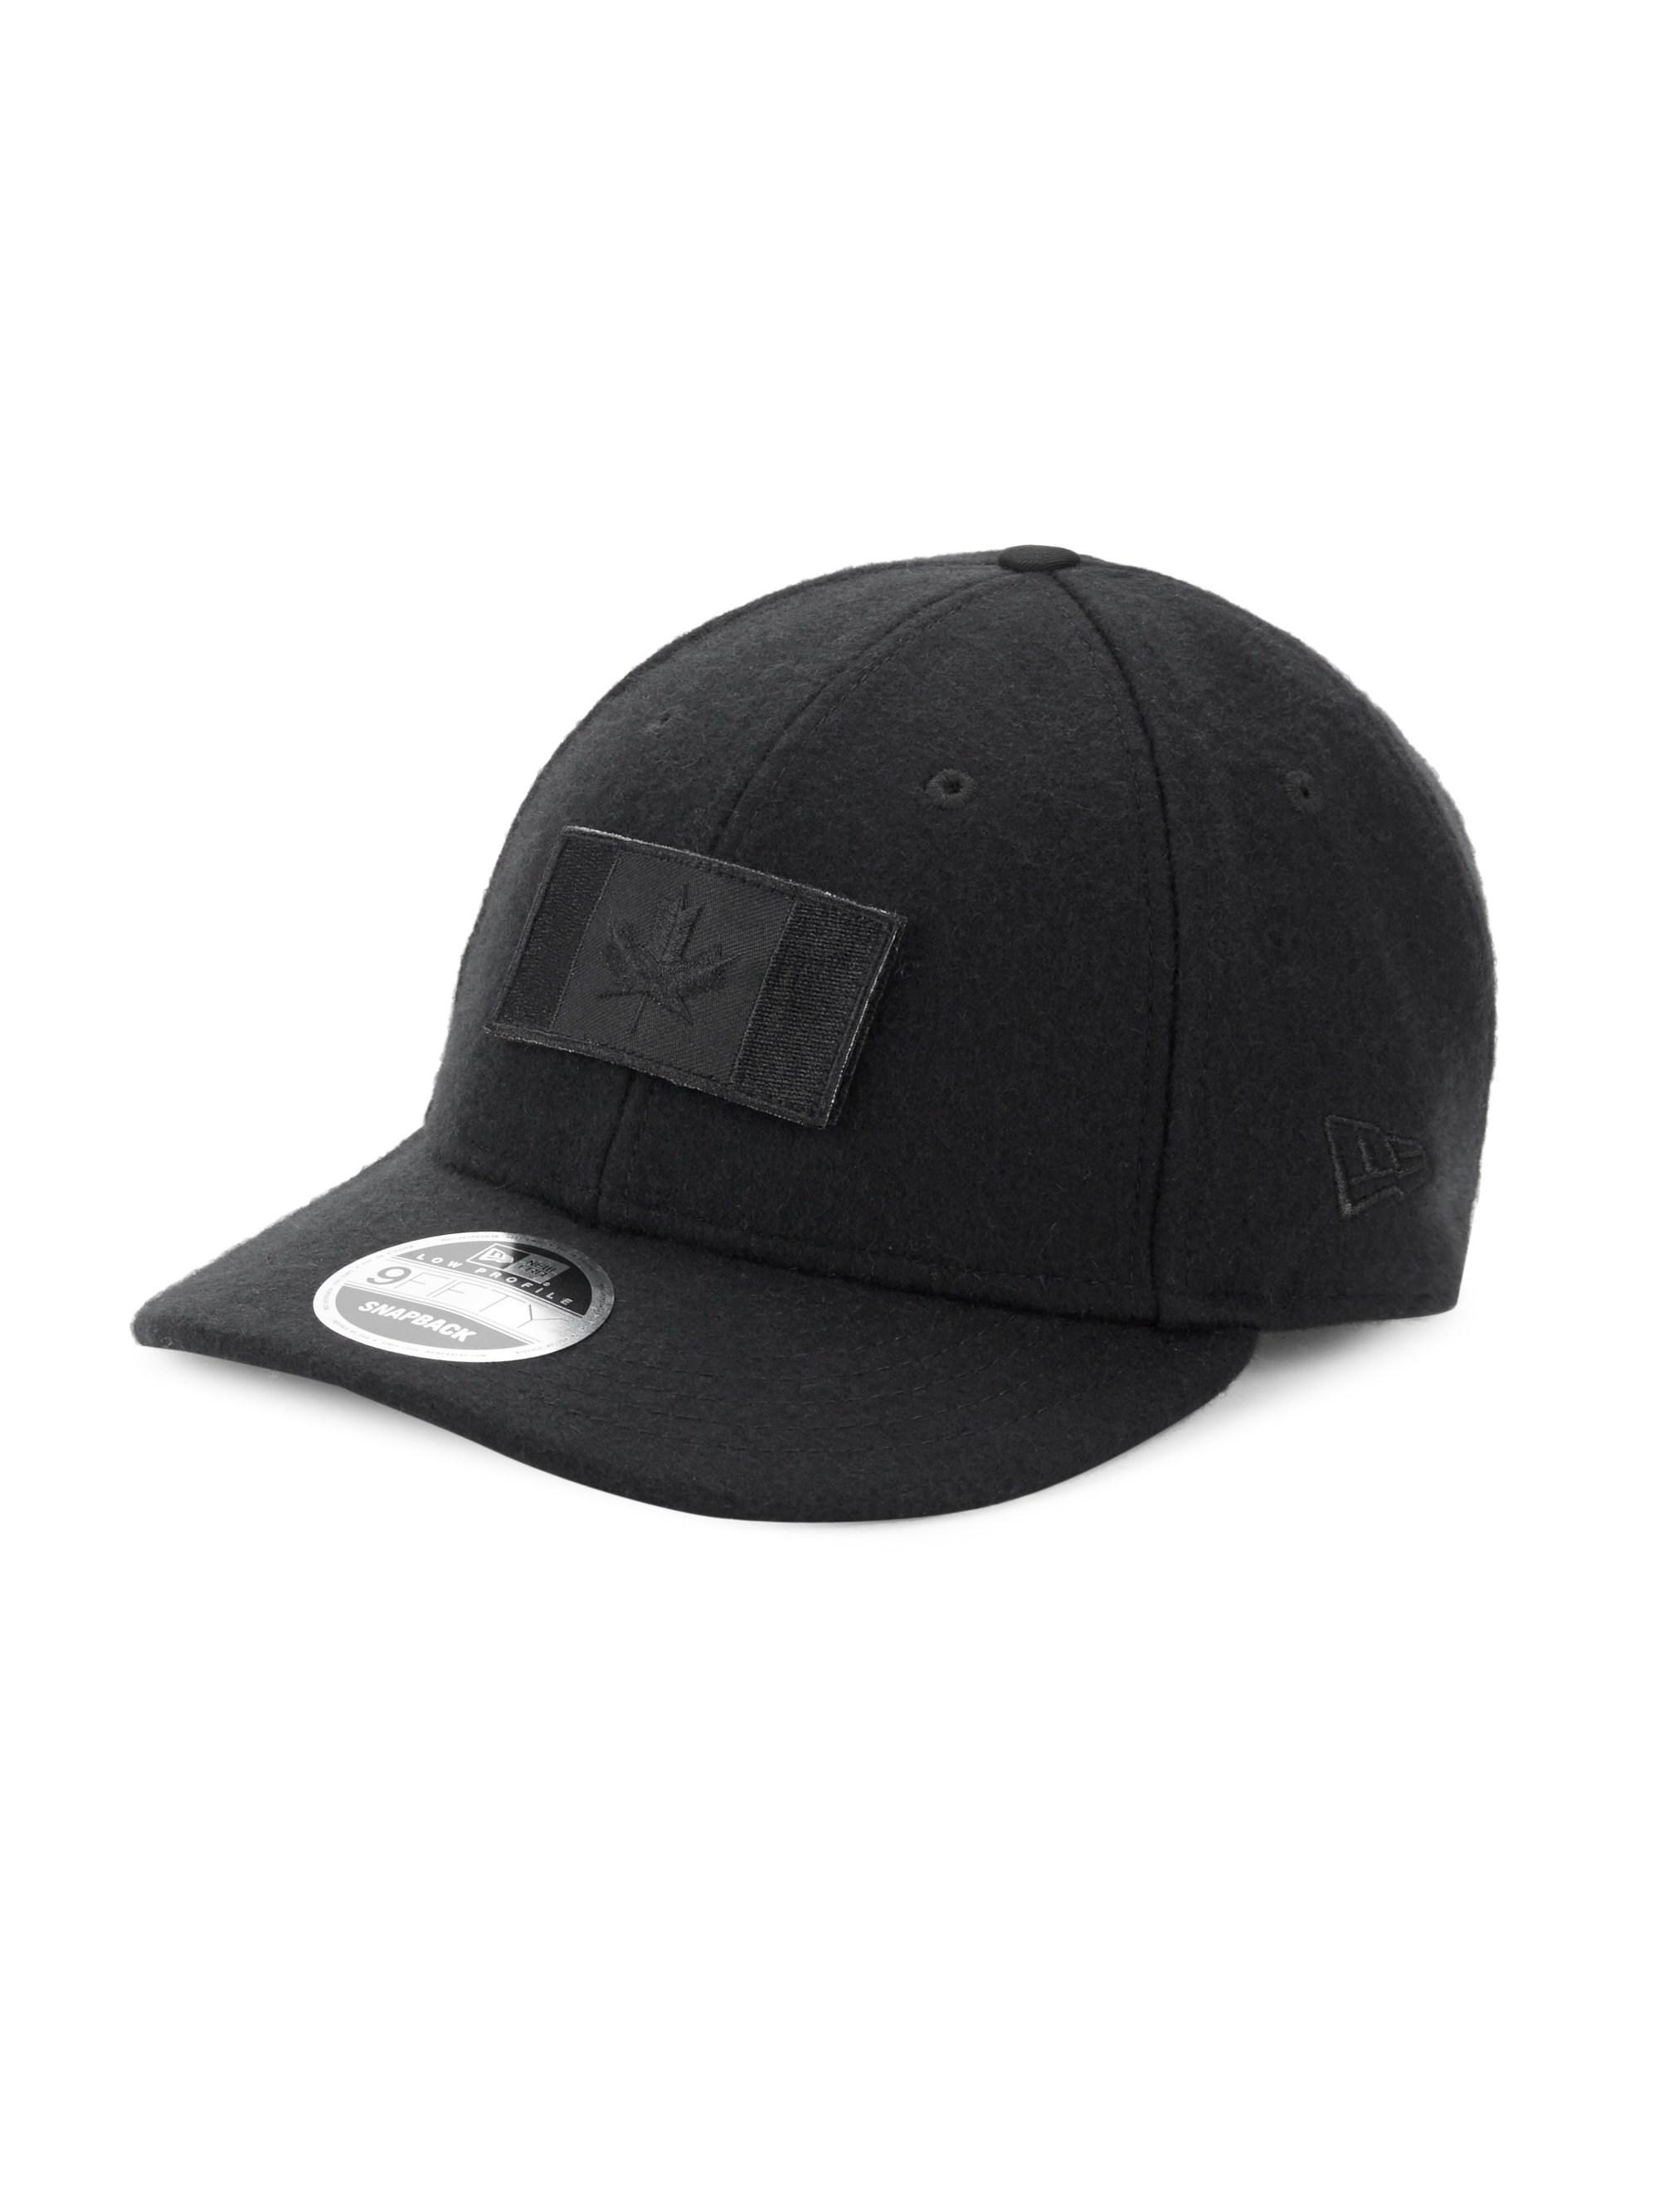 e112441cabf Canada Goose Melton Wool Baseball Hat in Black for Men - Lyst